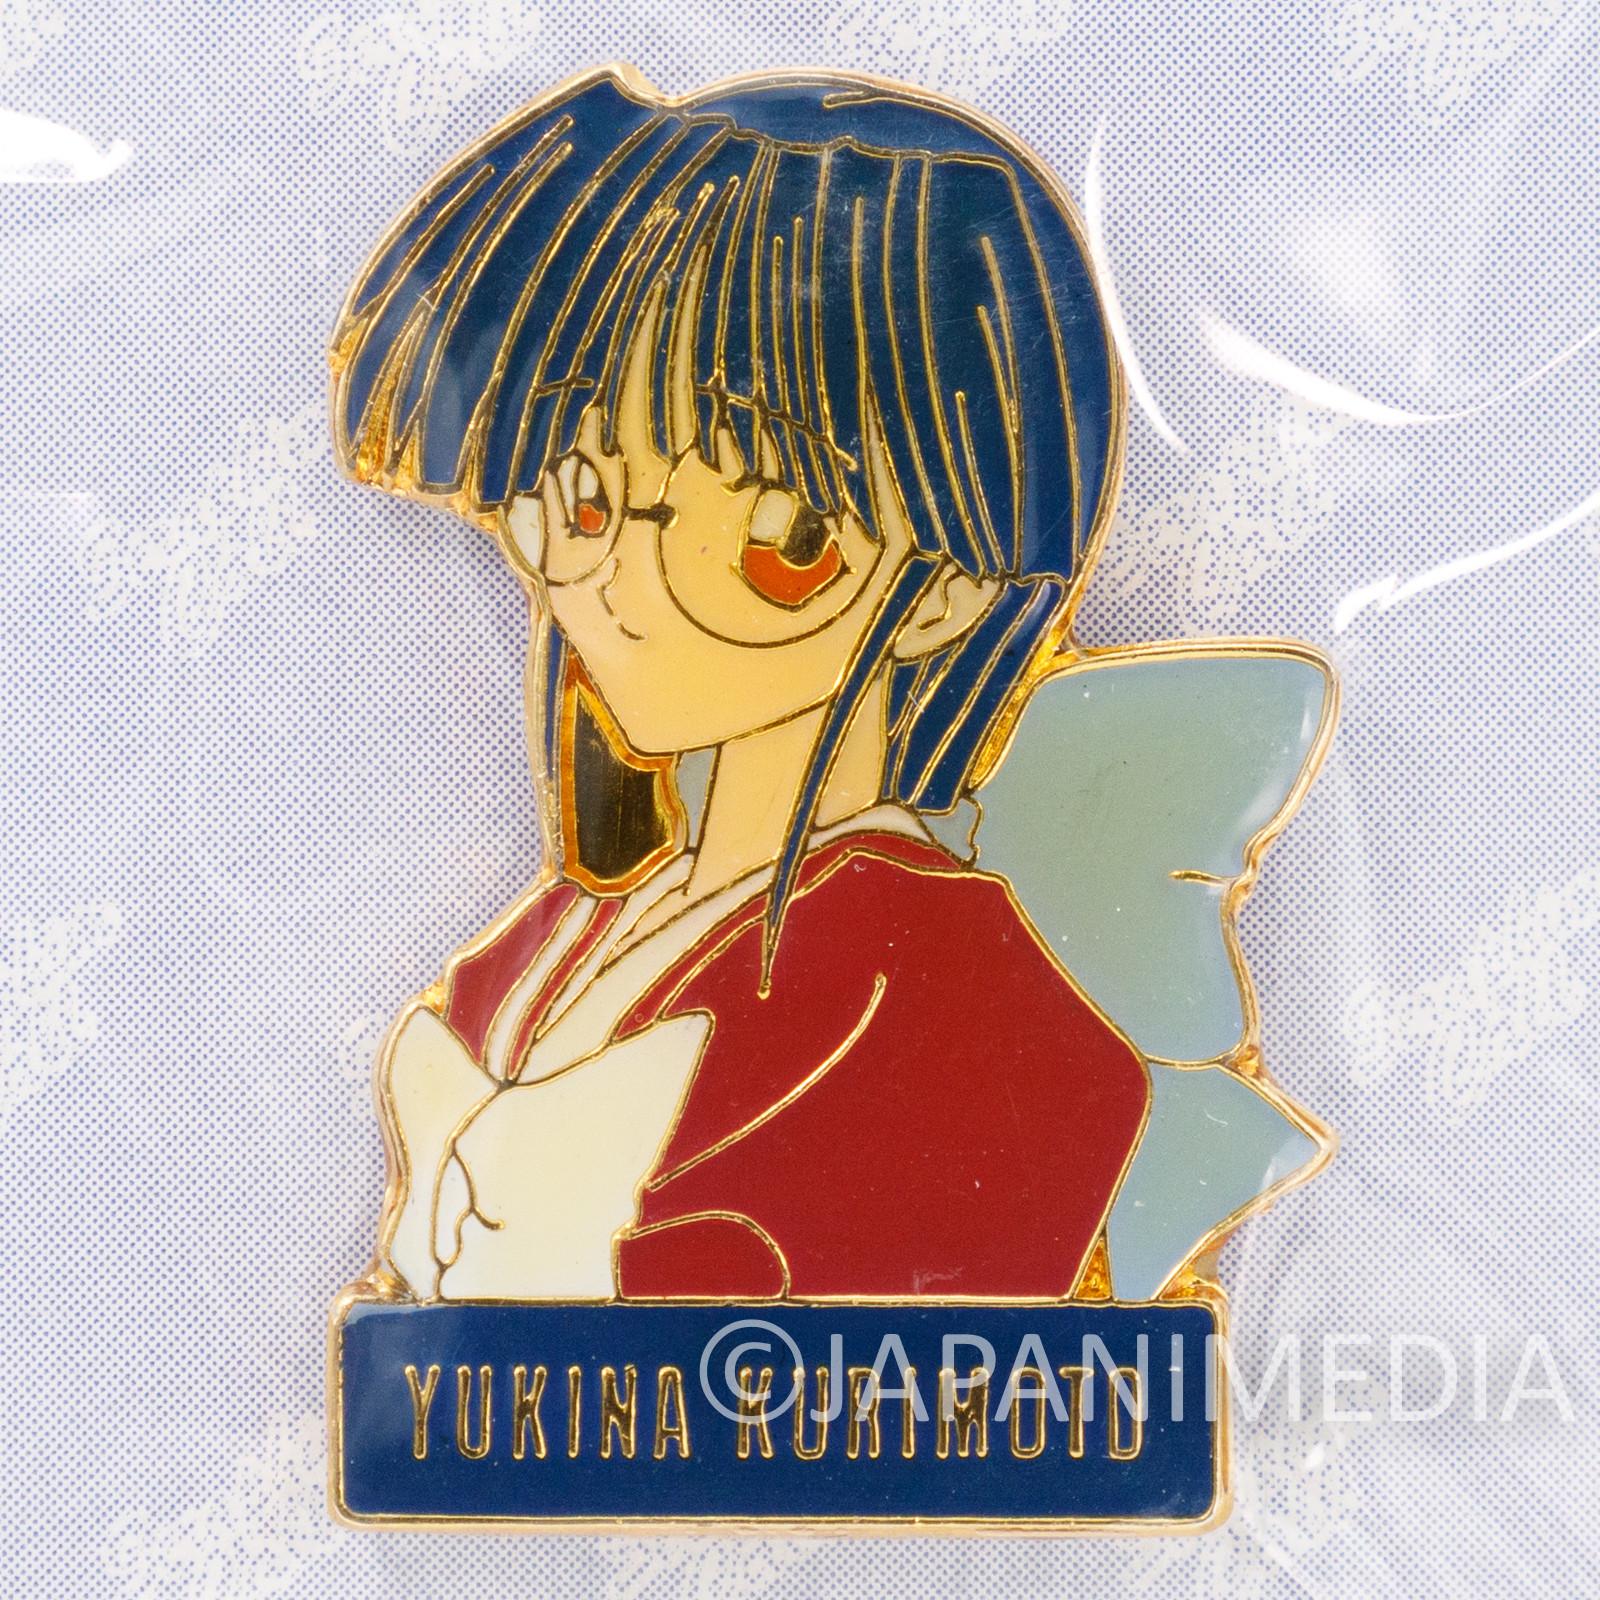 Seraphim Call Metal Pins Yukina Kurimoto Media Works JAPAN ANIME